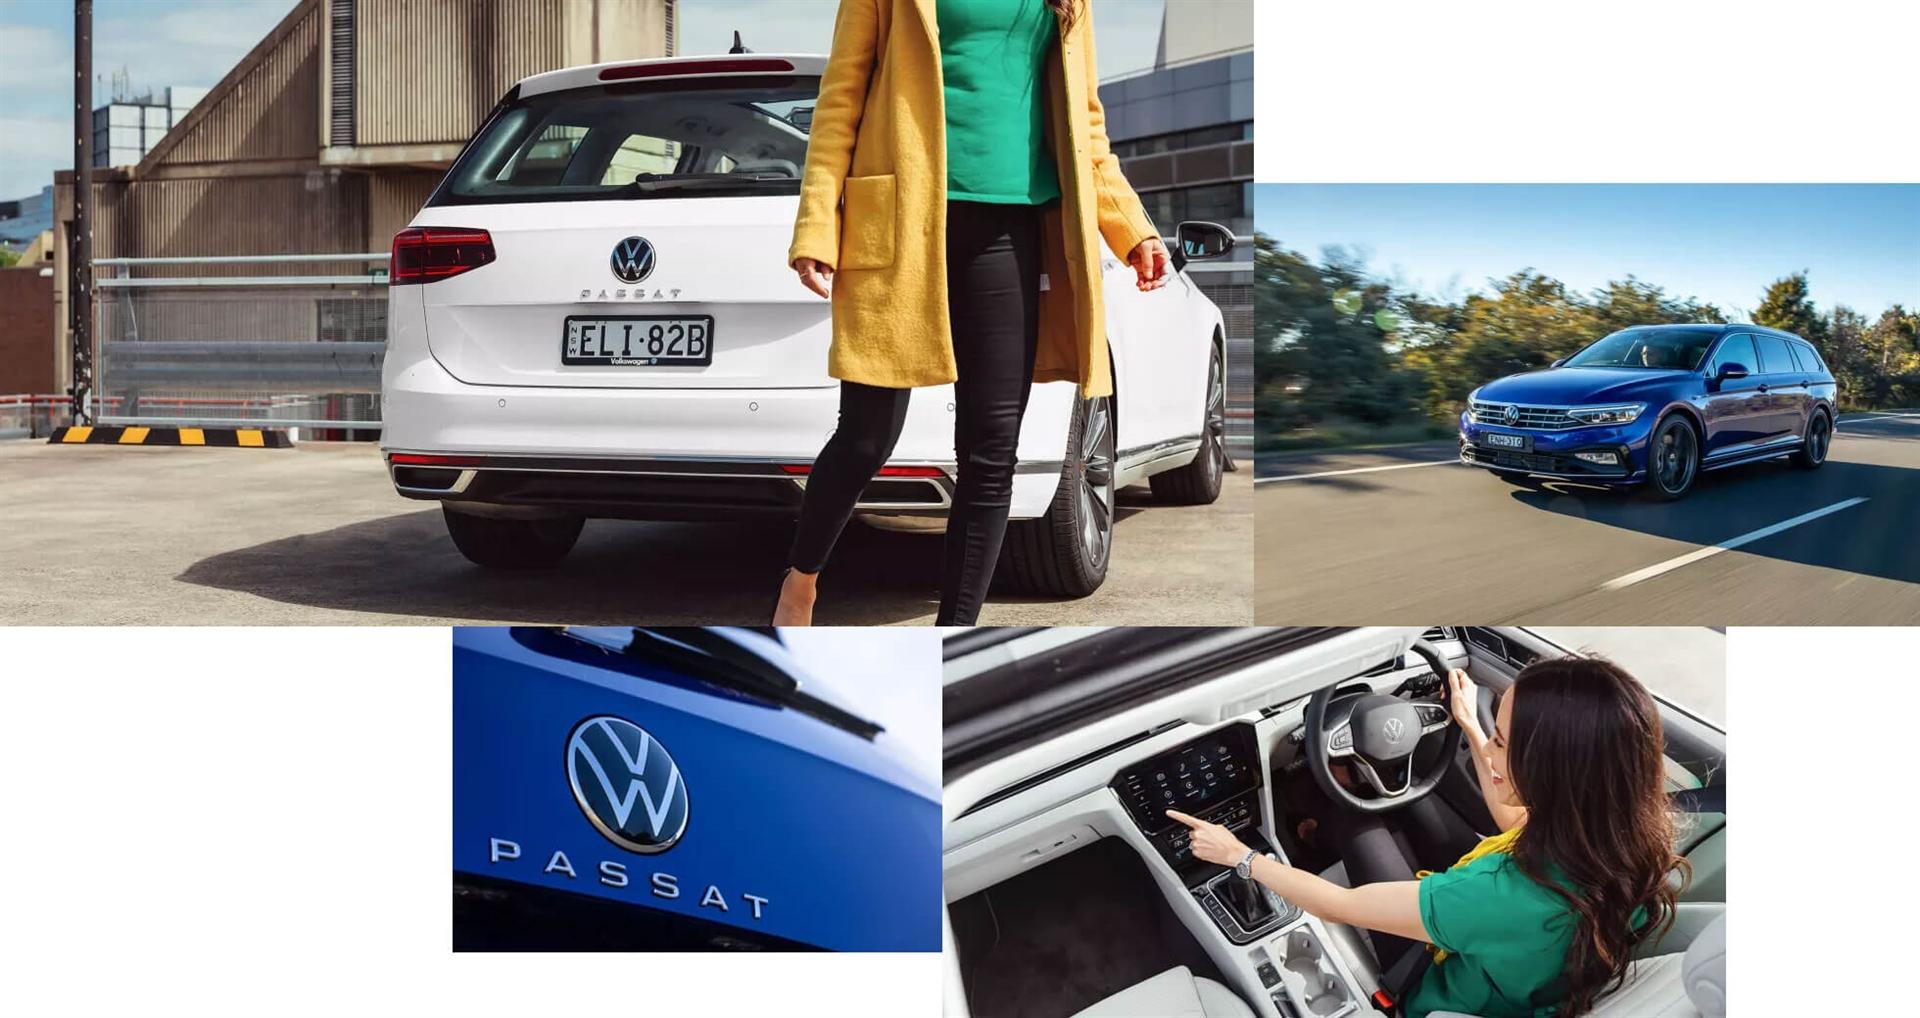 VW Passat Wagon